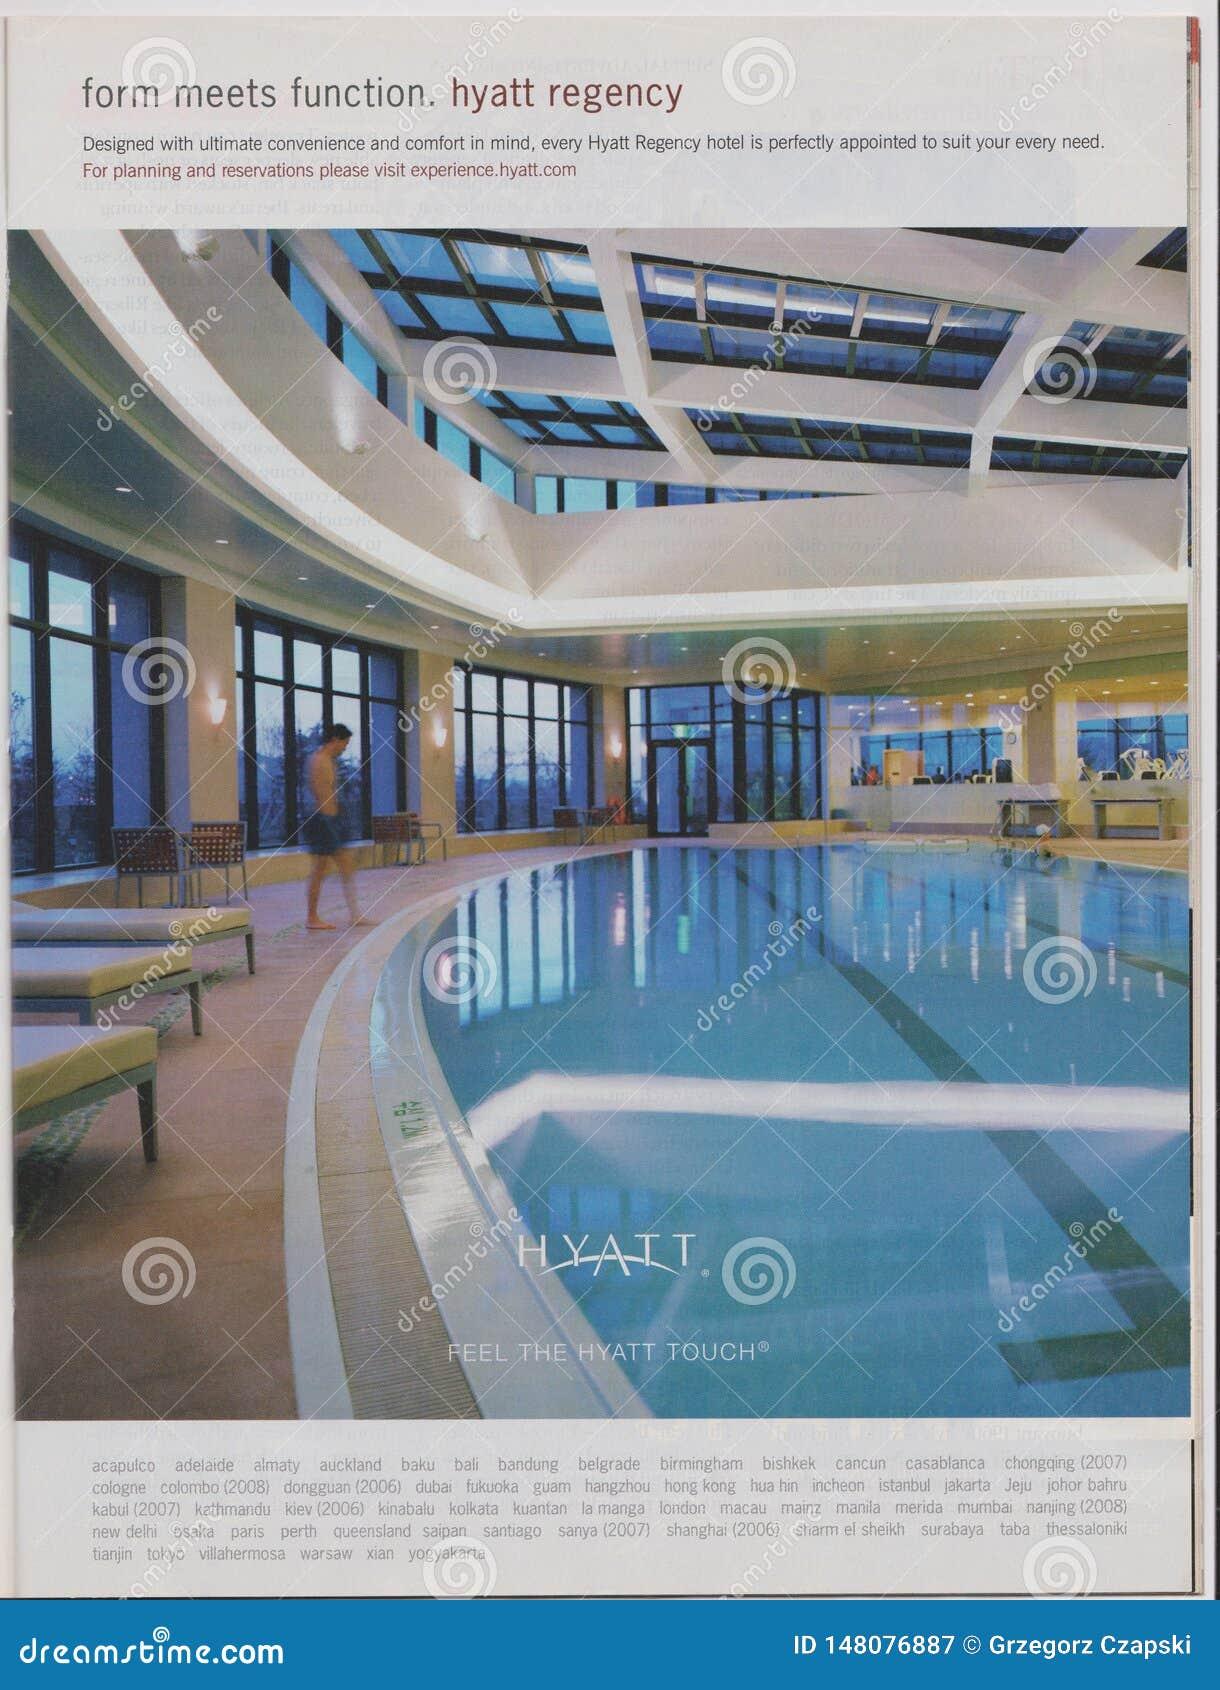 Poster advertising Hyatt Hotel in magazine from October 2005, form meets function. Feel the Hyatt touch slogan